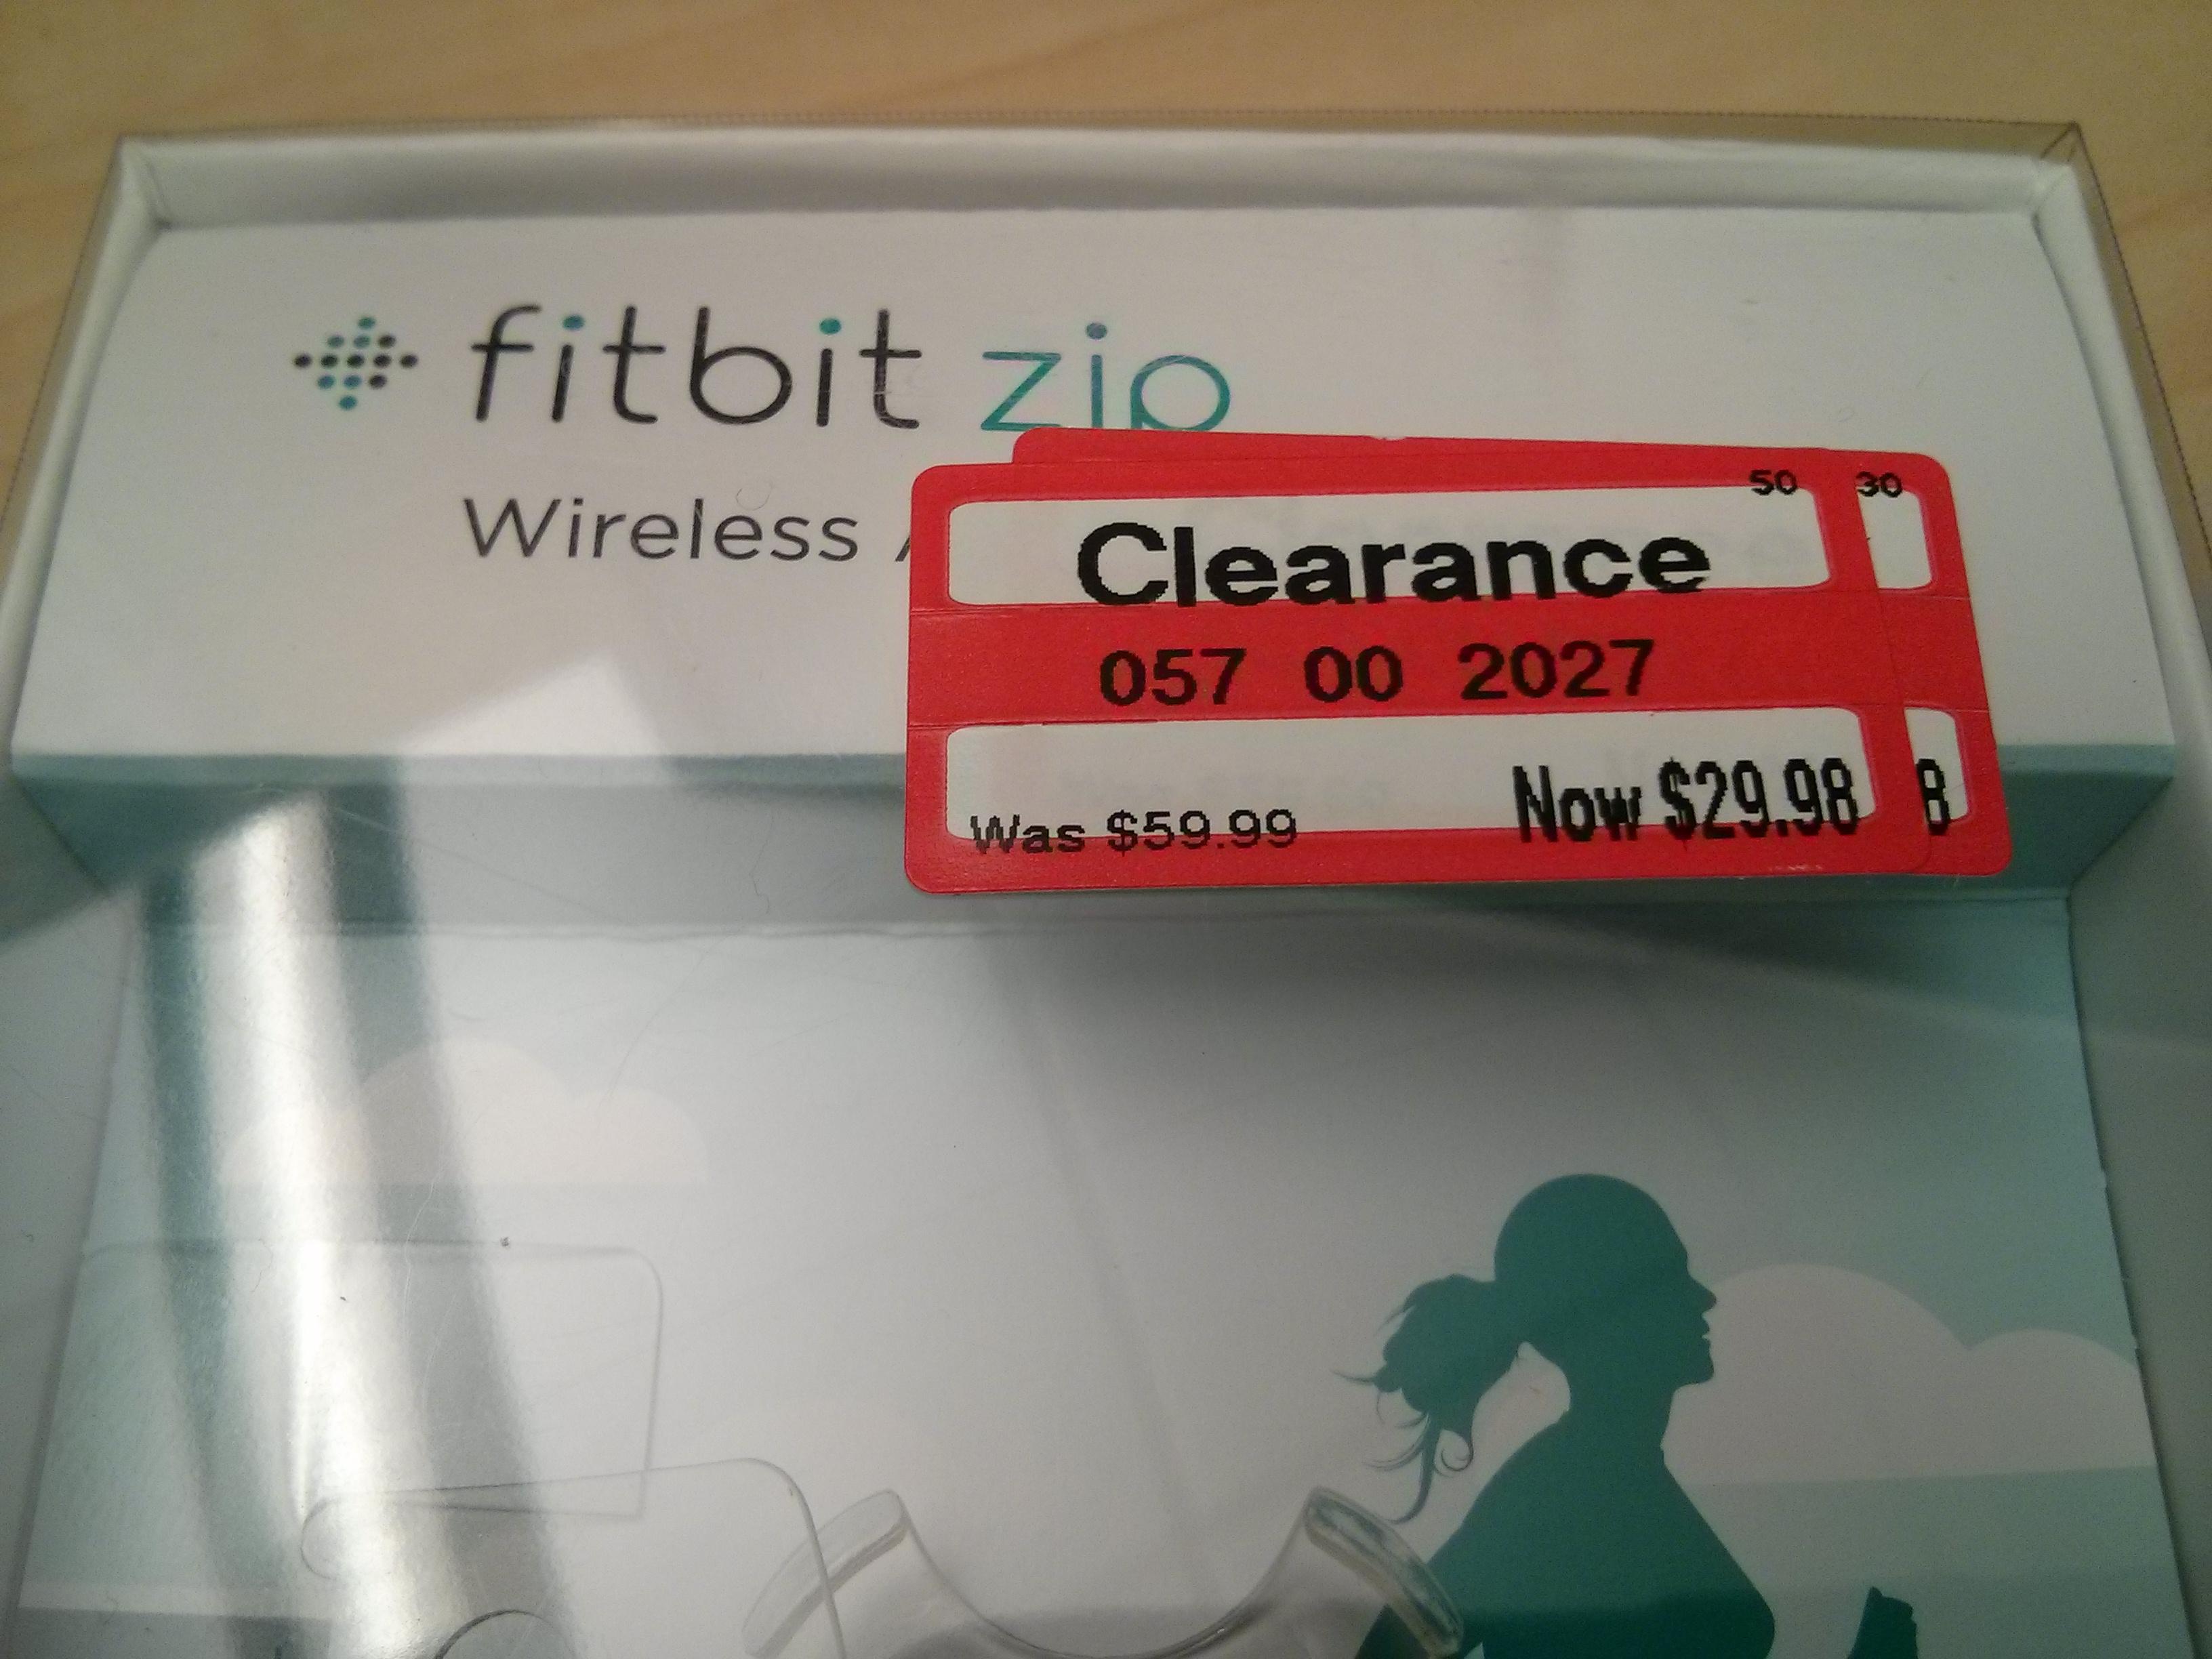 Fitbit Zip $29.98 Target clearance YMMV